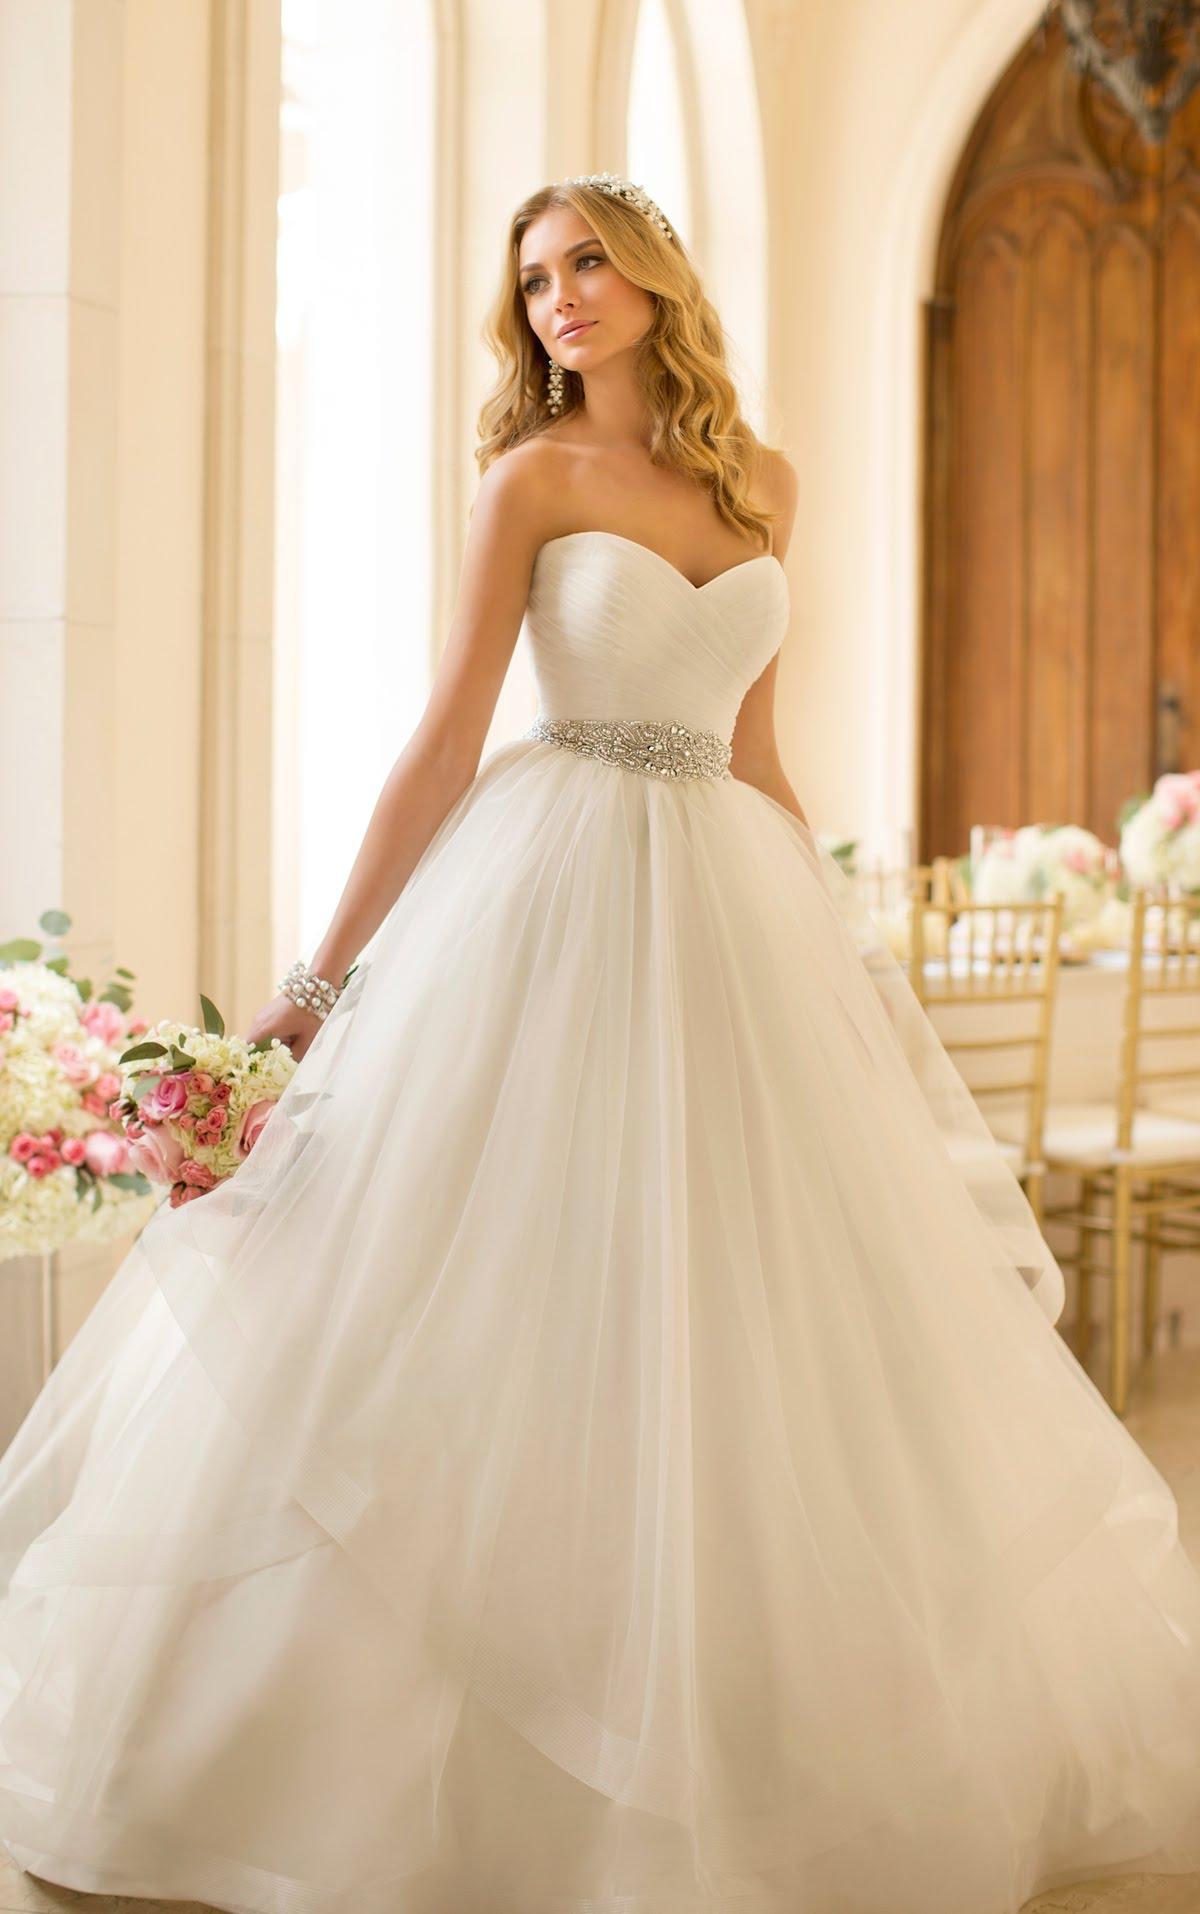 d9c81dc60507f صور فساتين للعرائس 2018  صور فساتين زفاف ...